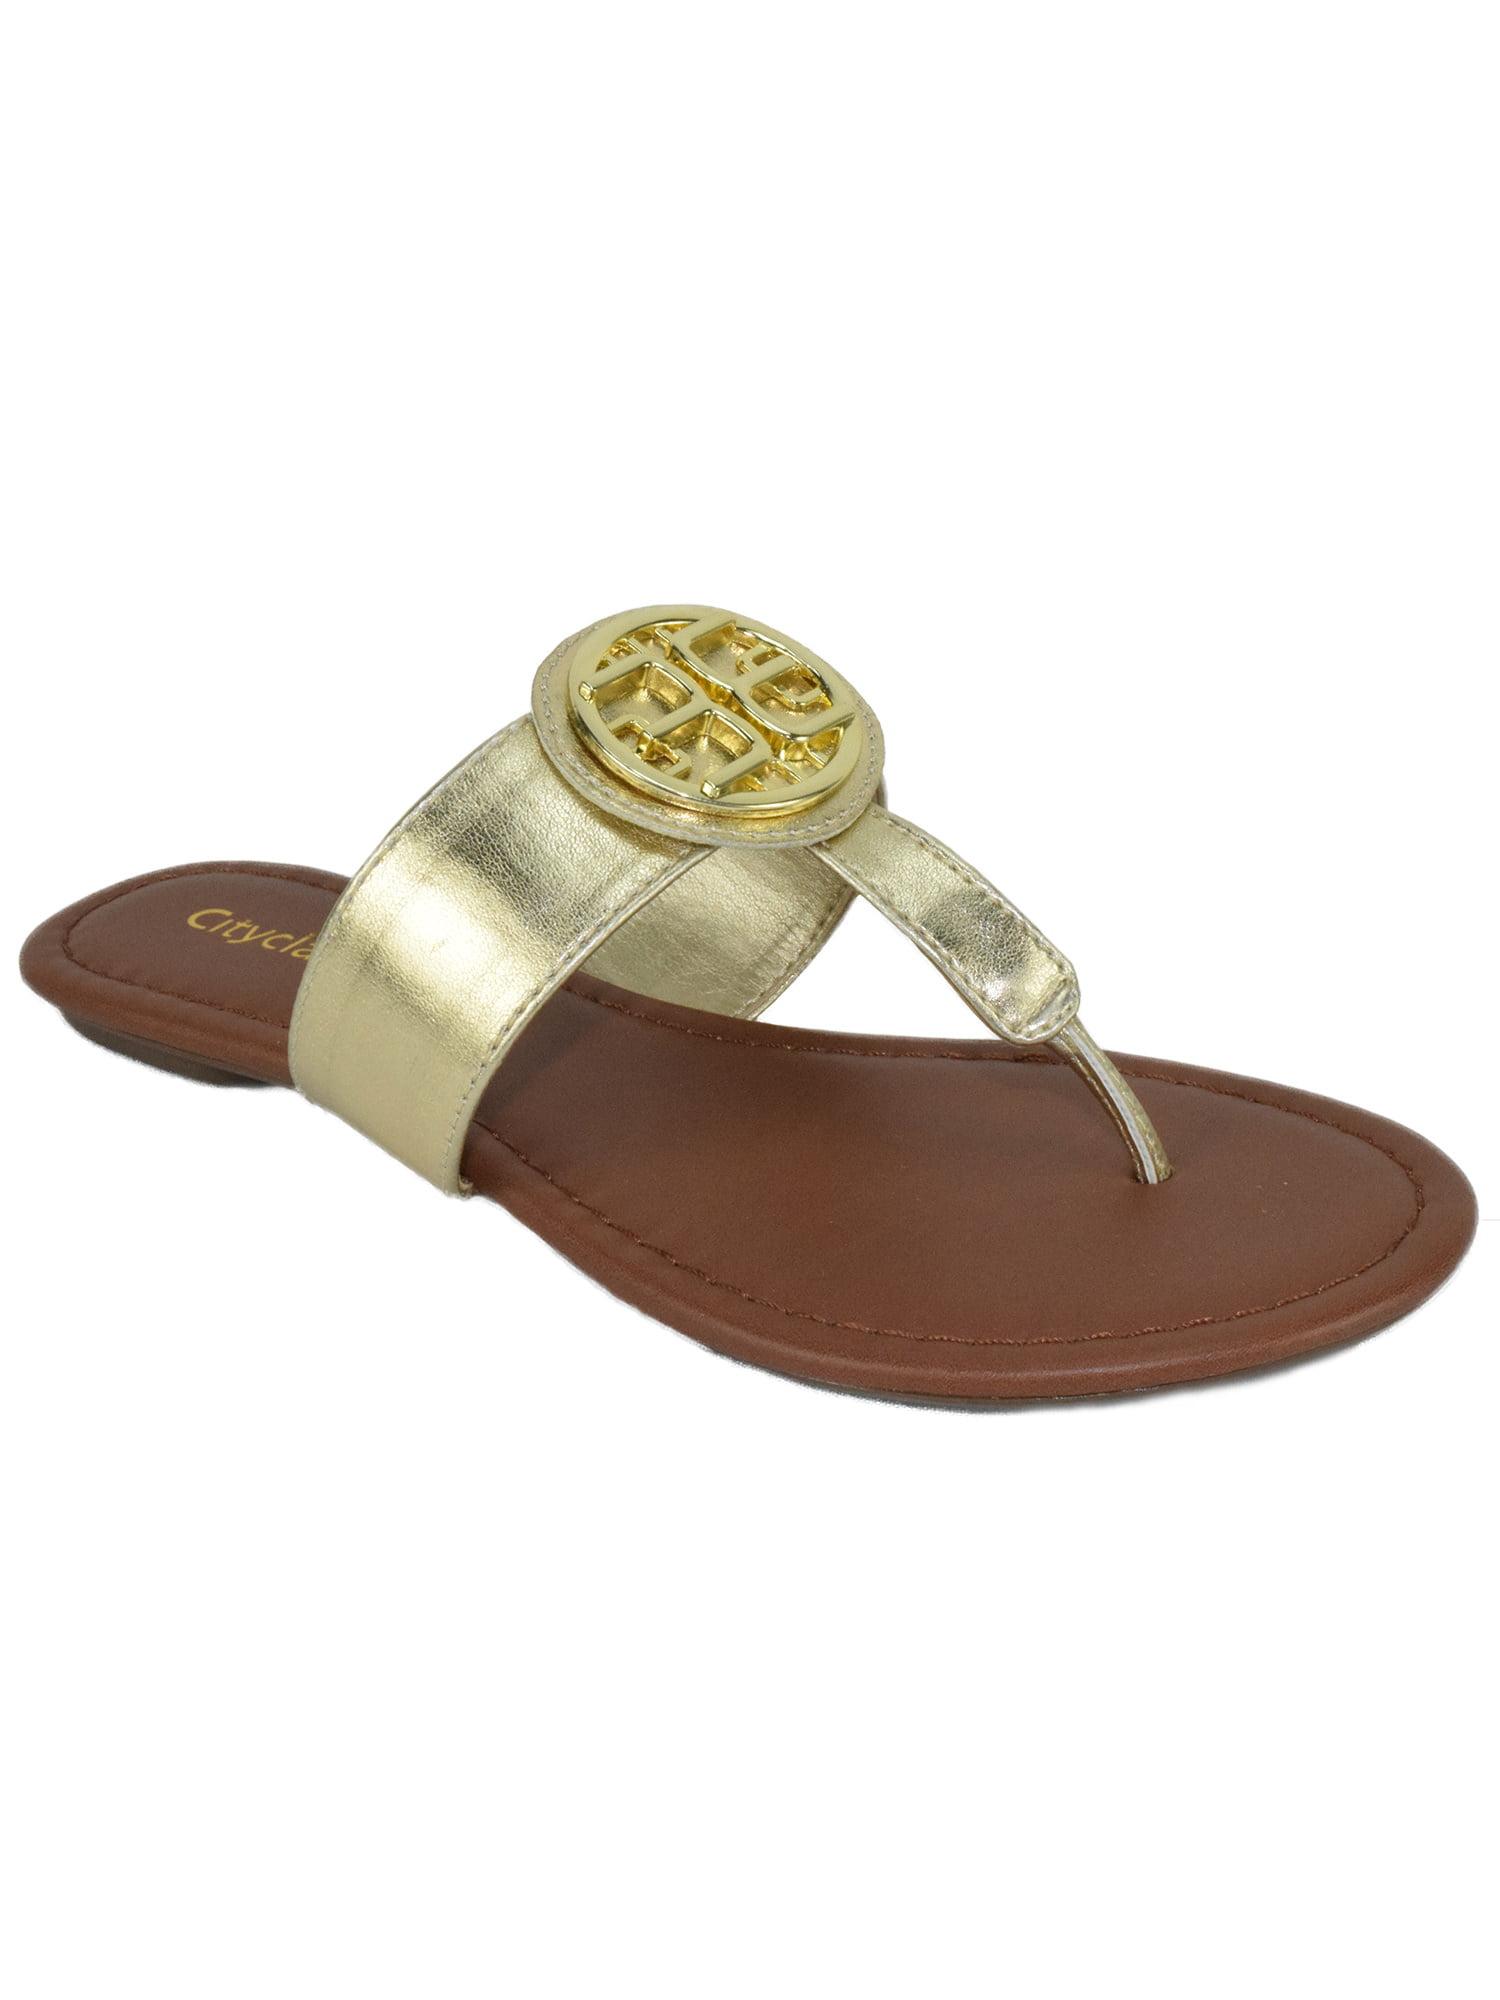 Newton Basic Thongs Flip Flops City Medallion Classified Shoes Women Gold Medallion City Flat Summer Sandals Black Patent 91fcd0